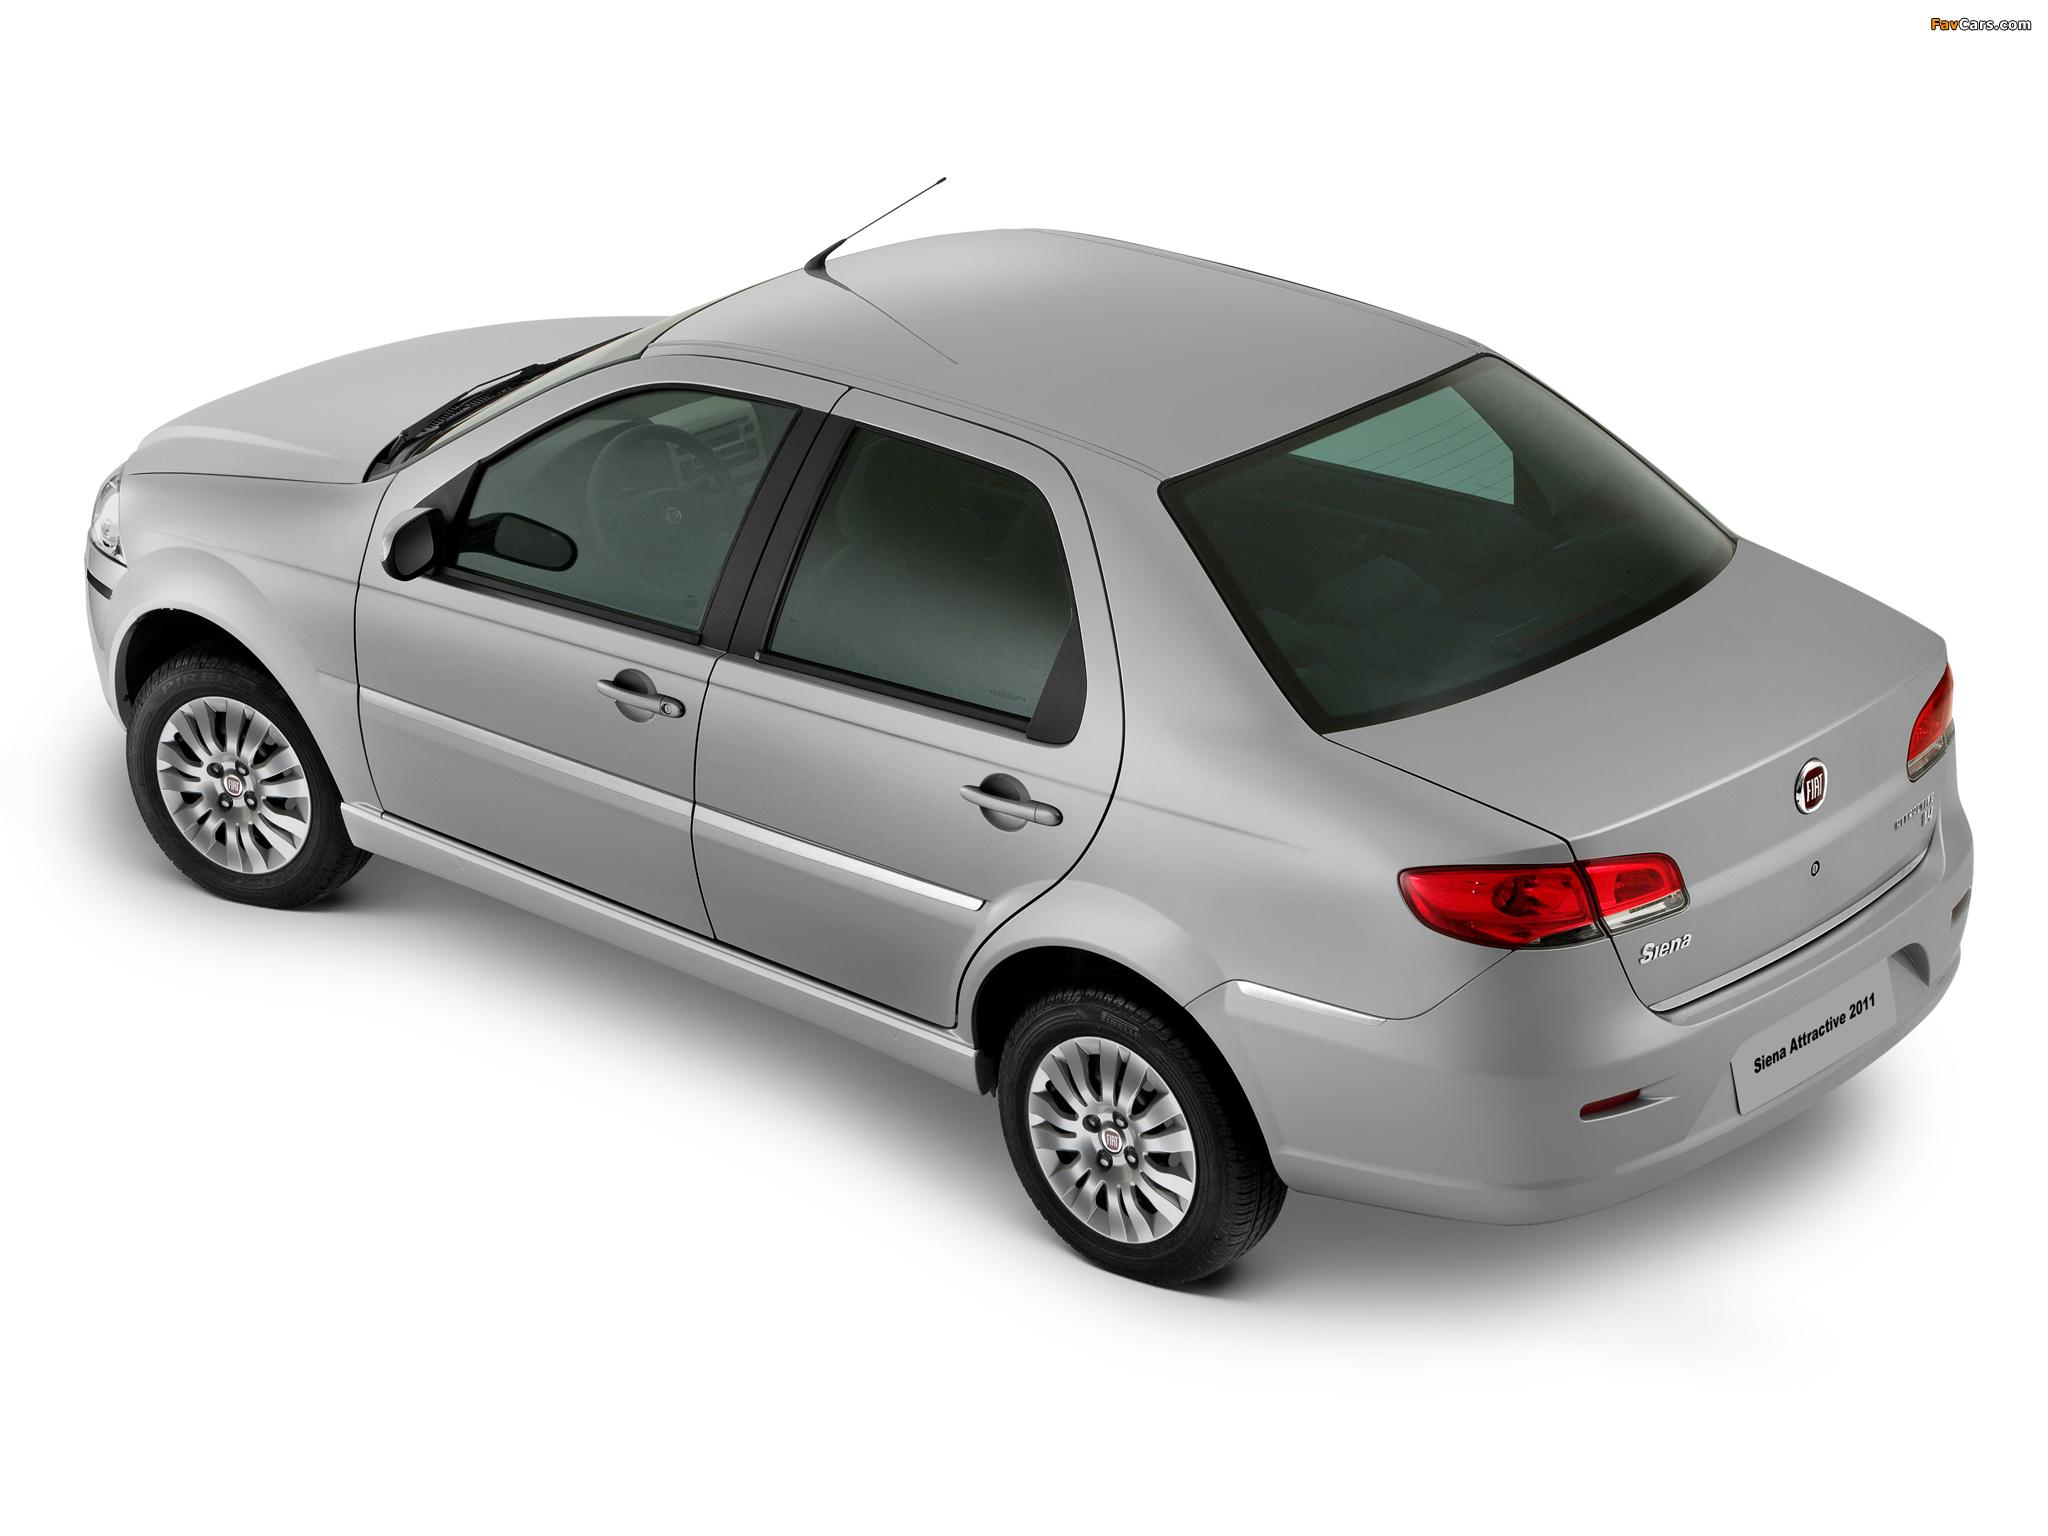 brcarro usado carros ve siena culos fiat novos hdr img compra venda de e